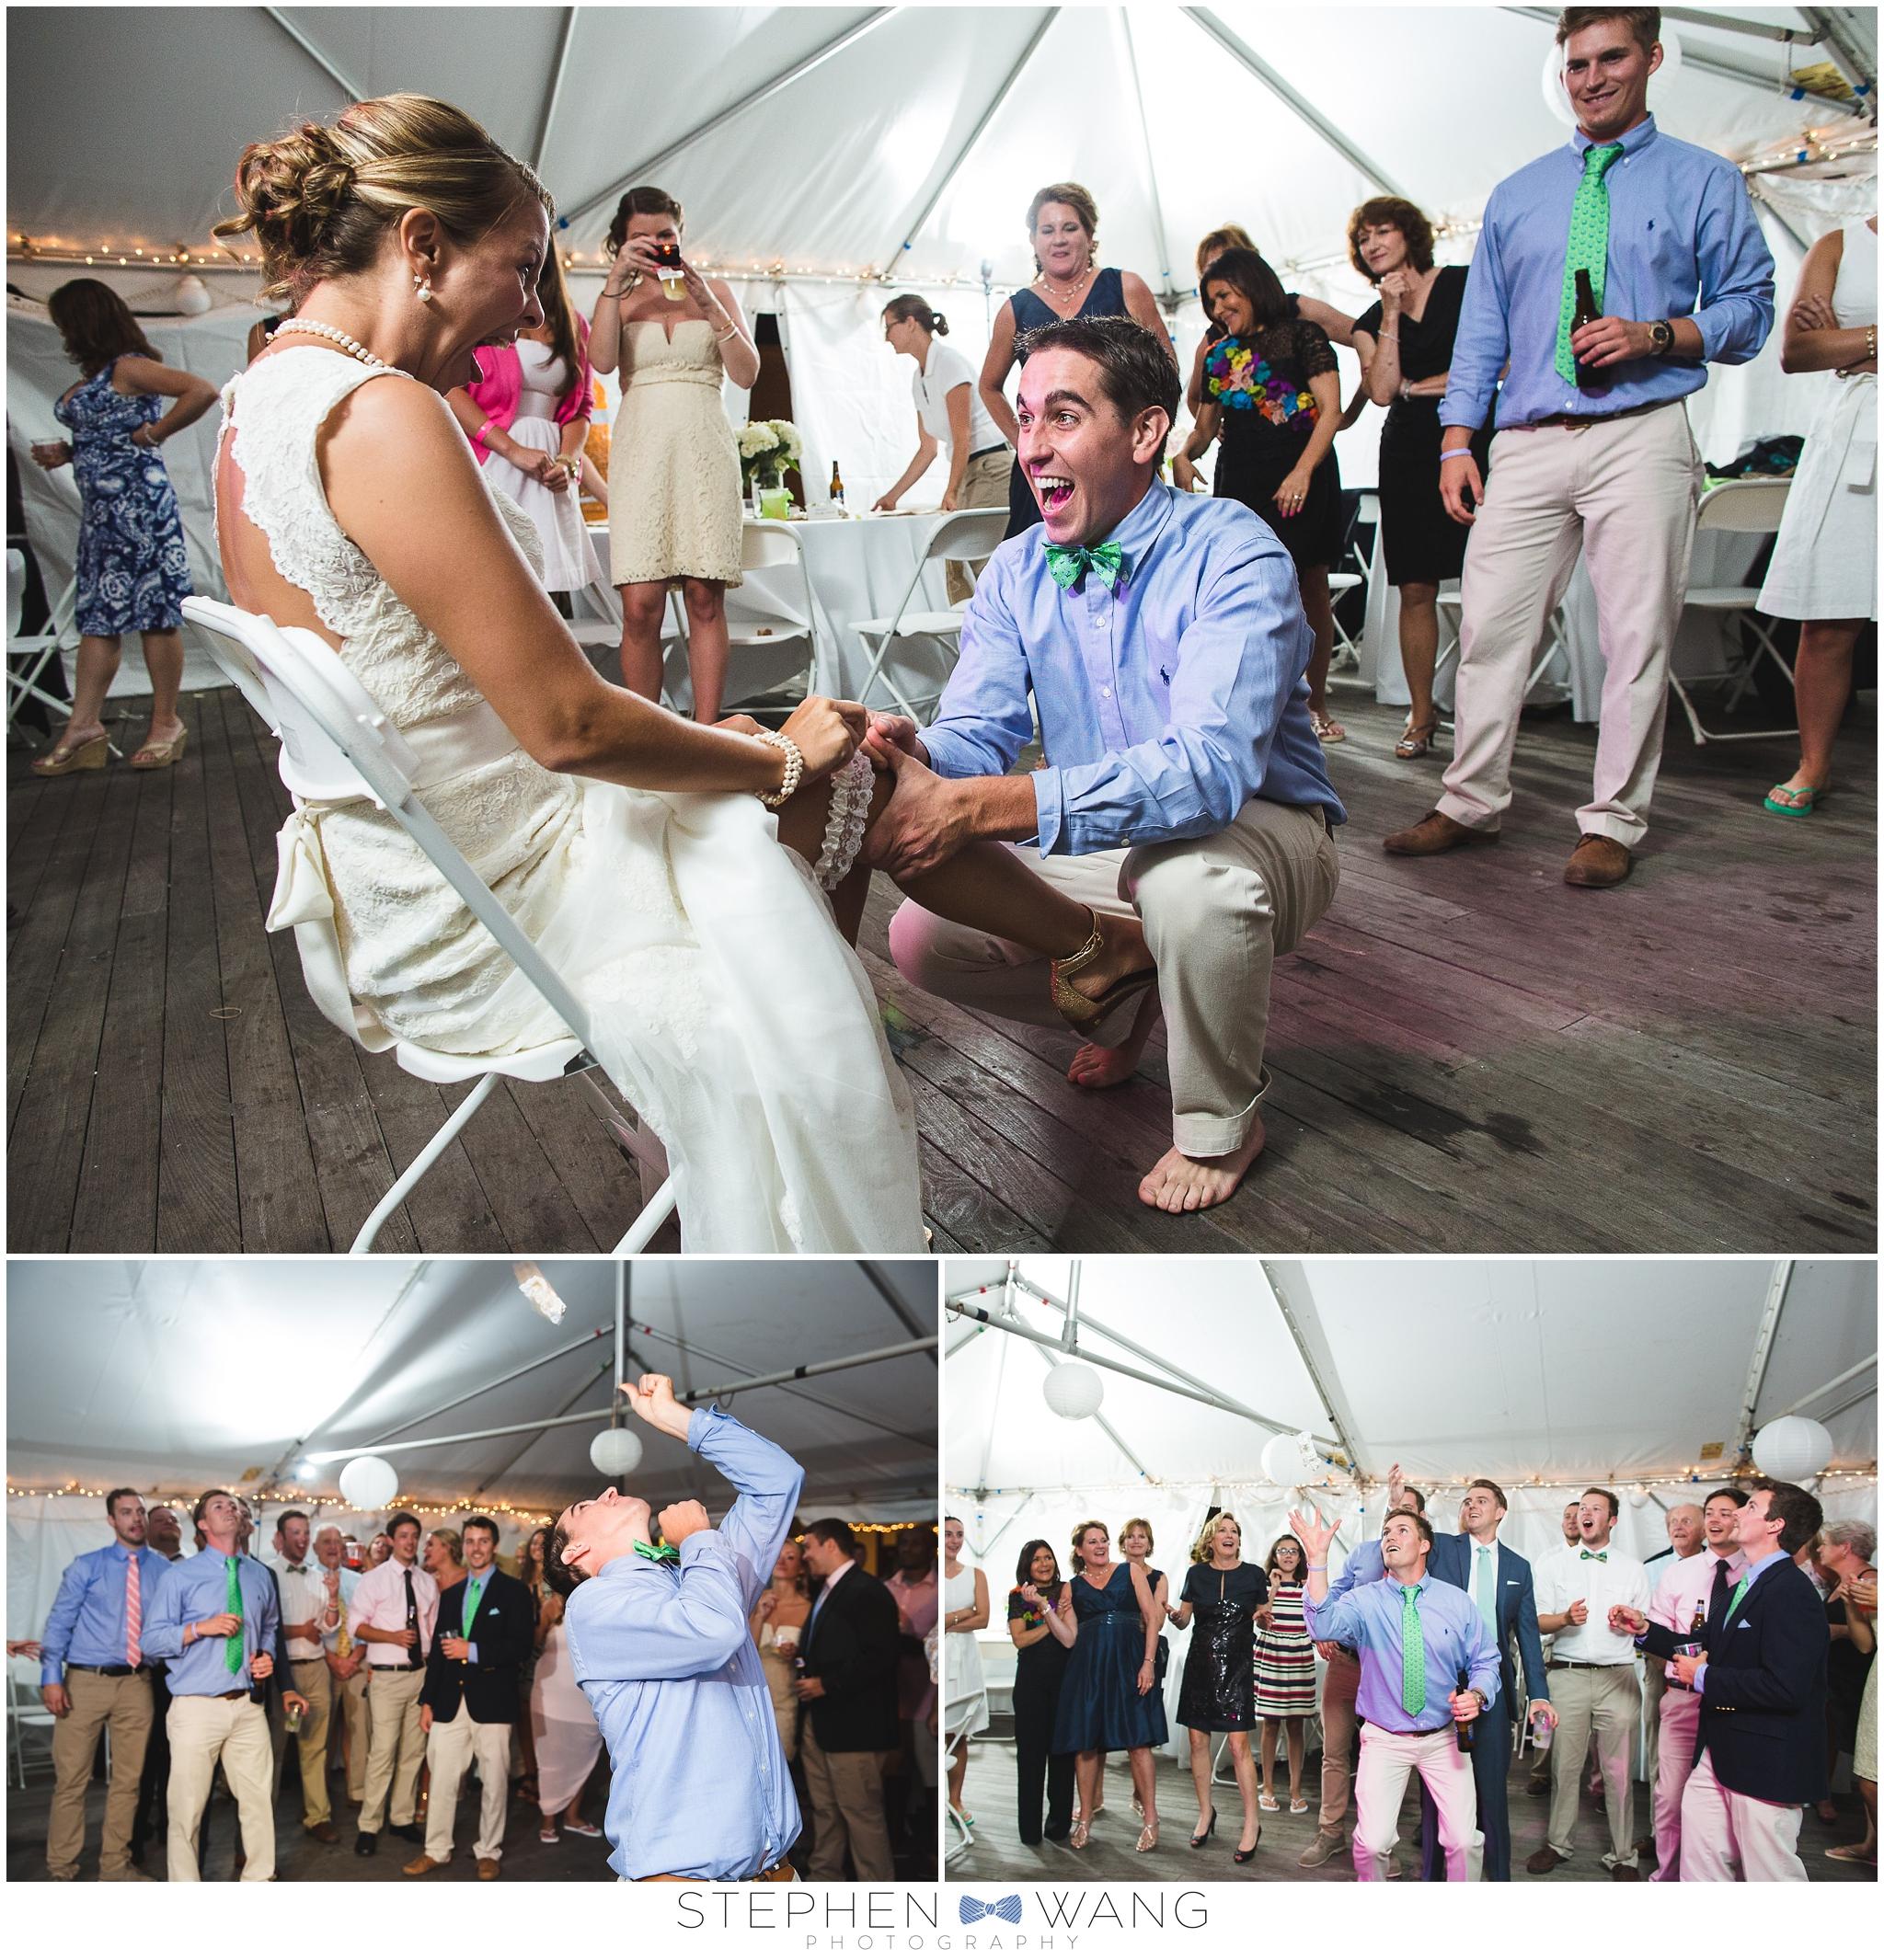 Stephen Wang Photography Madison Surf Club Wedding Photogrpahy CT Connecticut Shoreline Beach Summer Sunset -08-12_0033.jpg